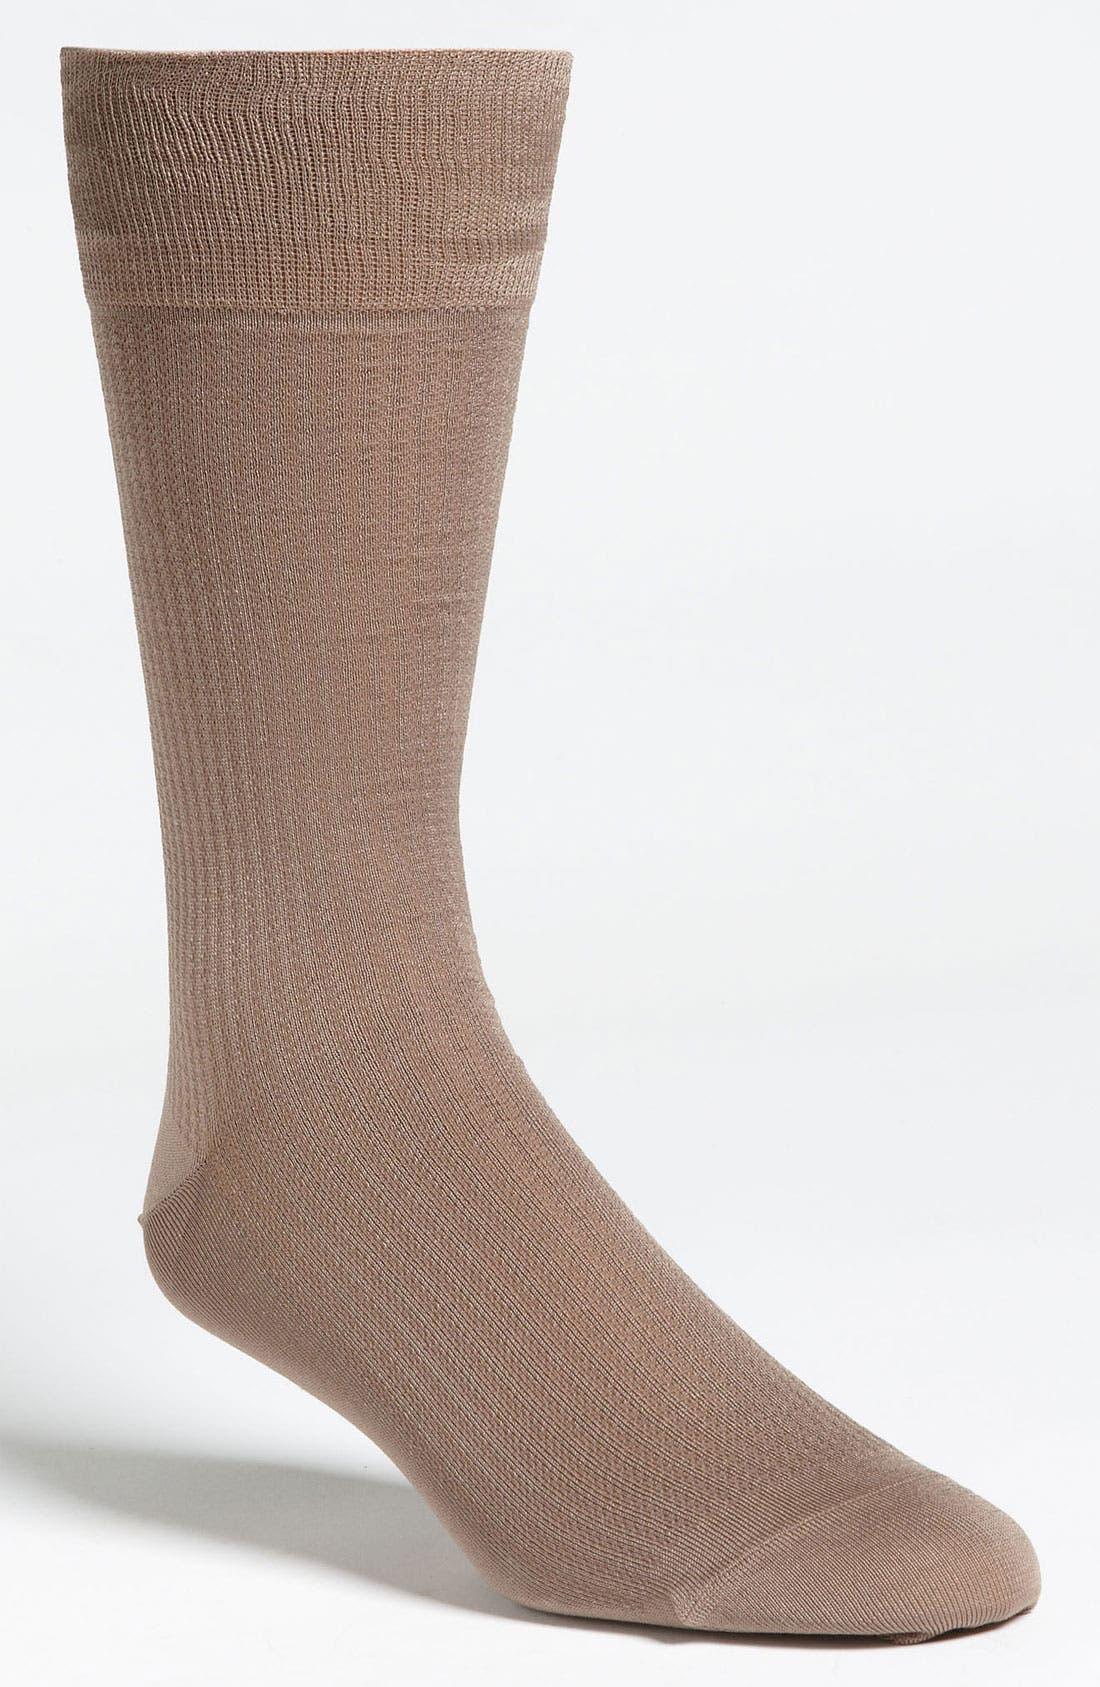 Alternate Image 1 Selected - John W. Nordstrom® Houndstooth Socks